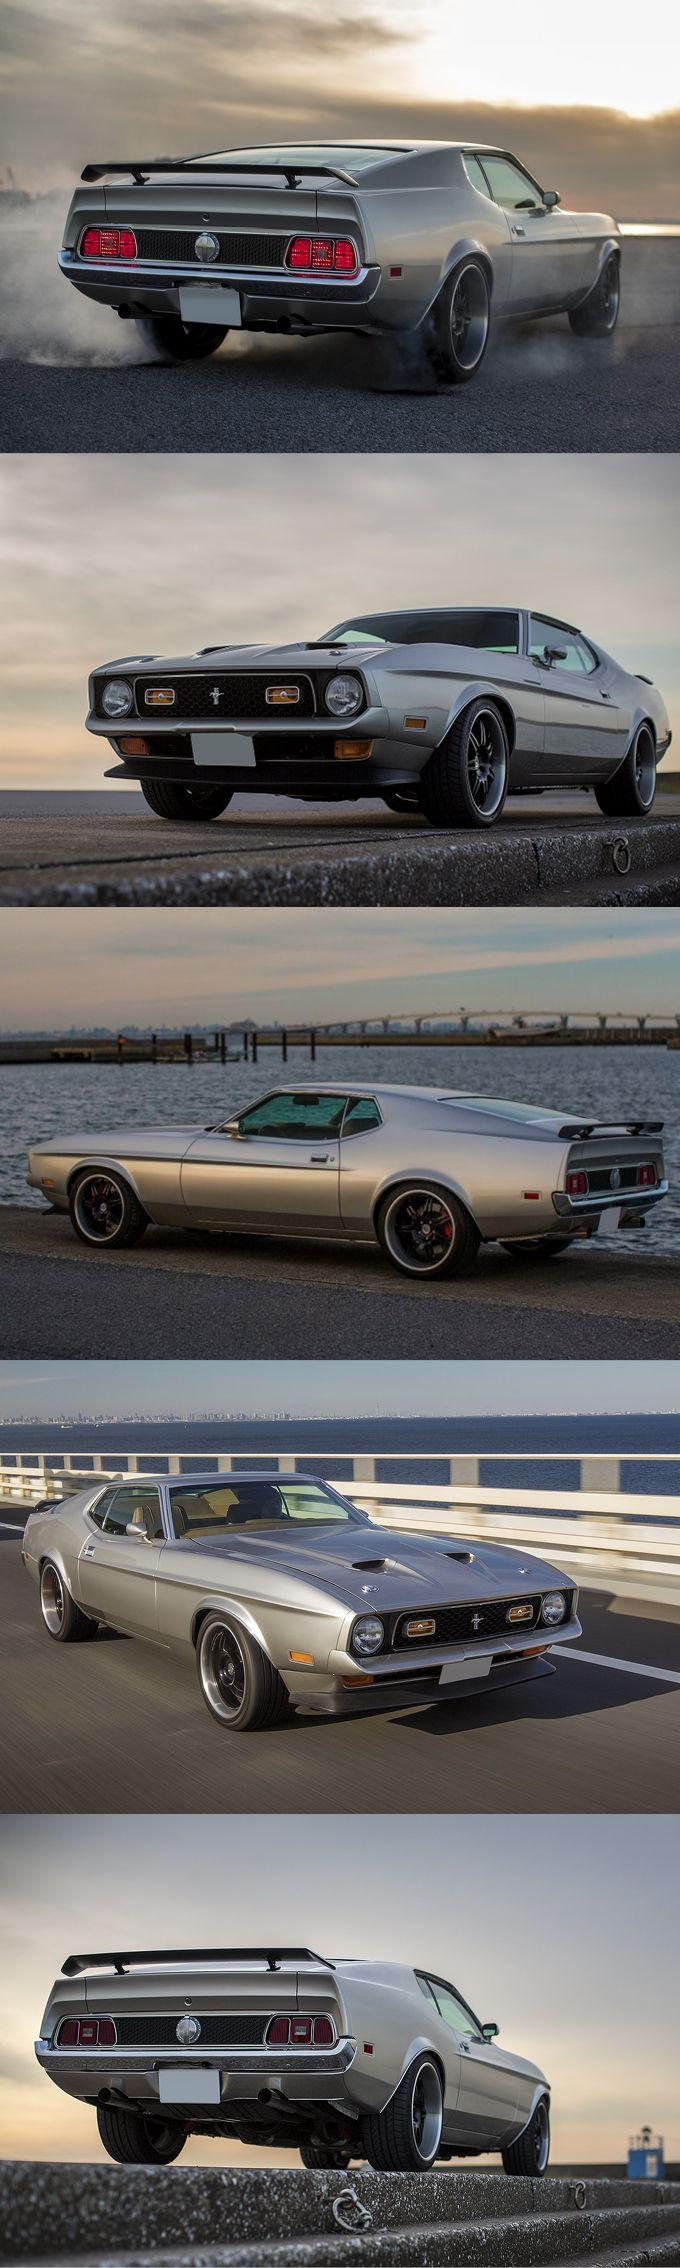 1971 Ford Mustang Mach I / USA / silver / 17-250 / Sportsroof https://www.amazon.co.uk/Baby-Car-Mirror-Shatterproof-Installation/dp/B06XHG6SSY/ref=sr_1_2?ie=UTF8&qid=1499074433&sr=8-2&keywords=Kingseye